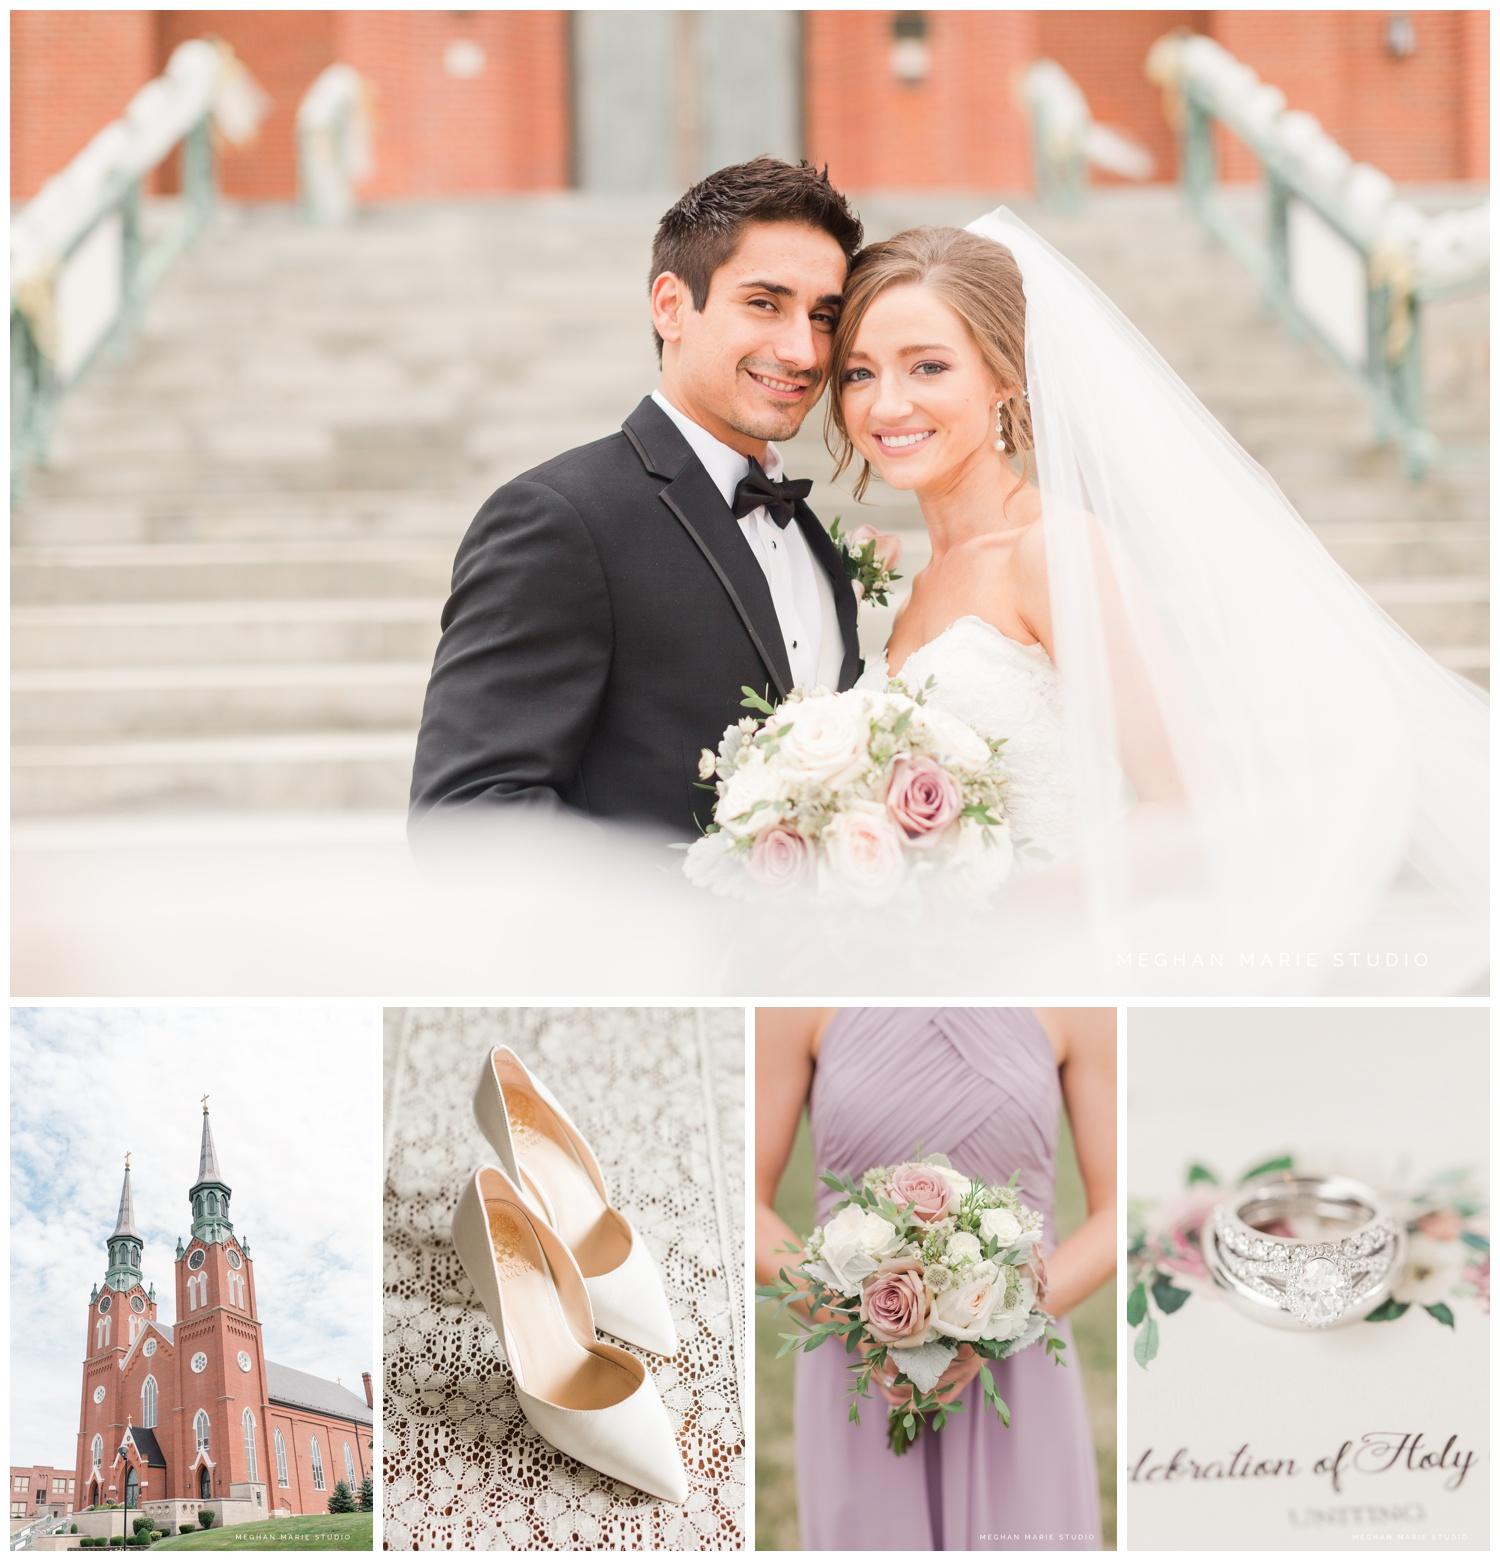 meghan marie studio wedding photographer ohio dayton cincinnati columbus minster st augustine dusty purple rose interracial couple romers catering_0690.jpg